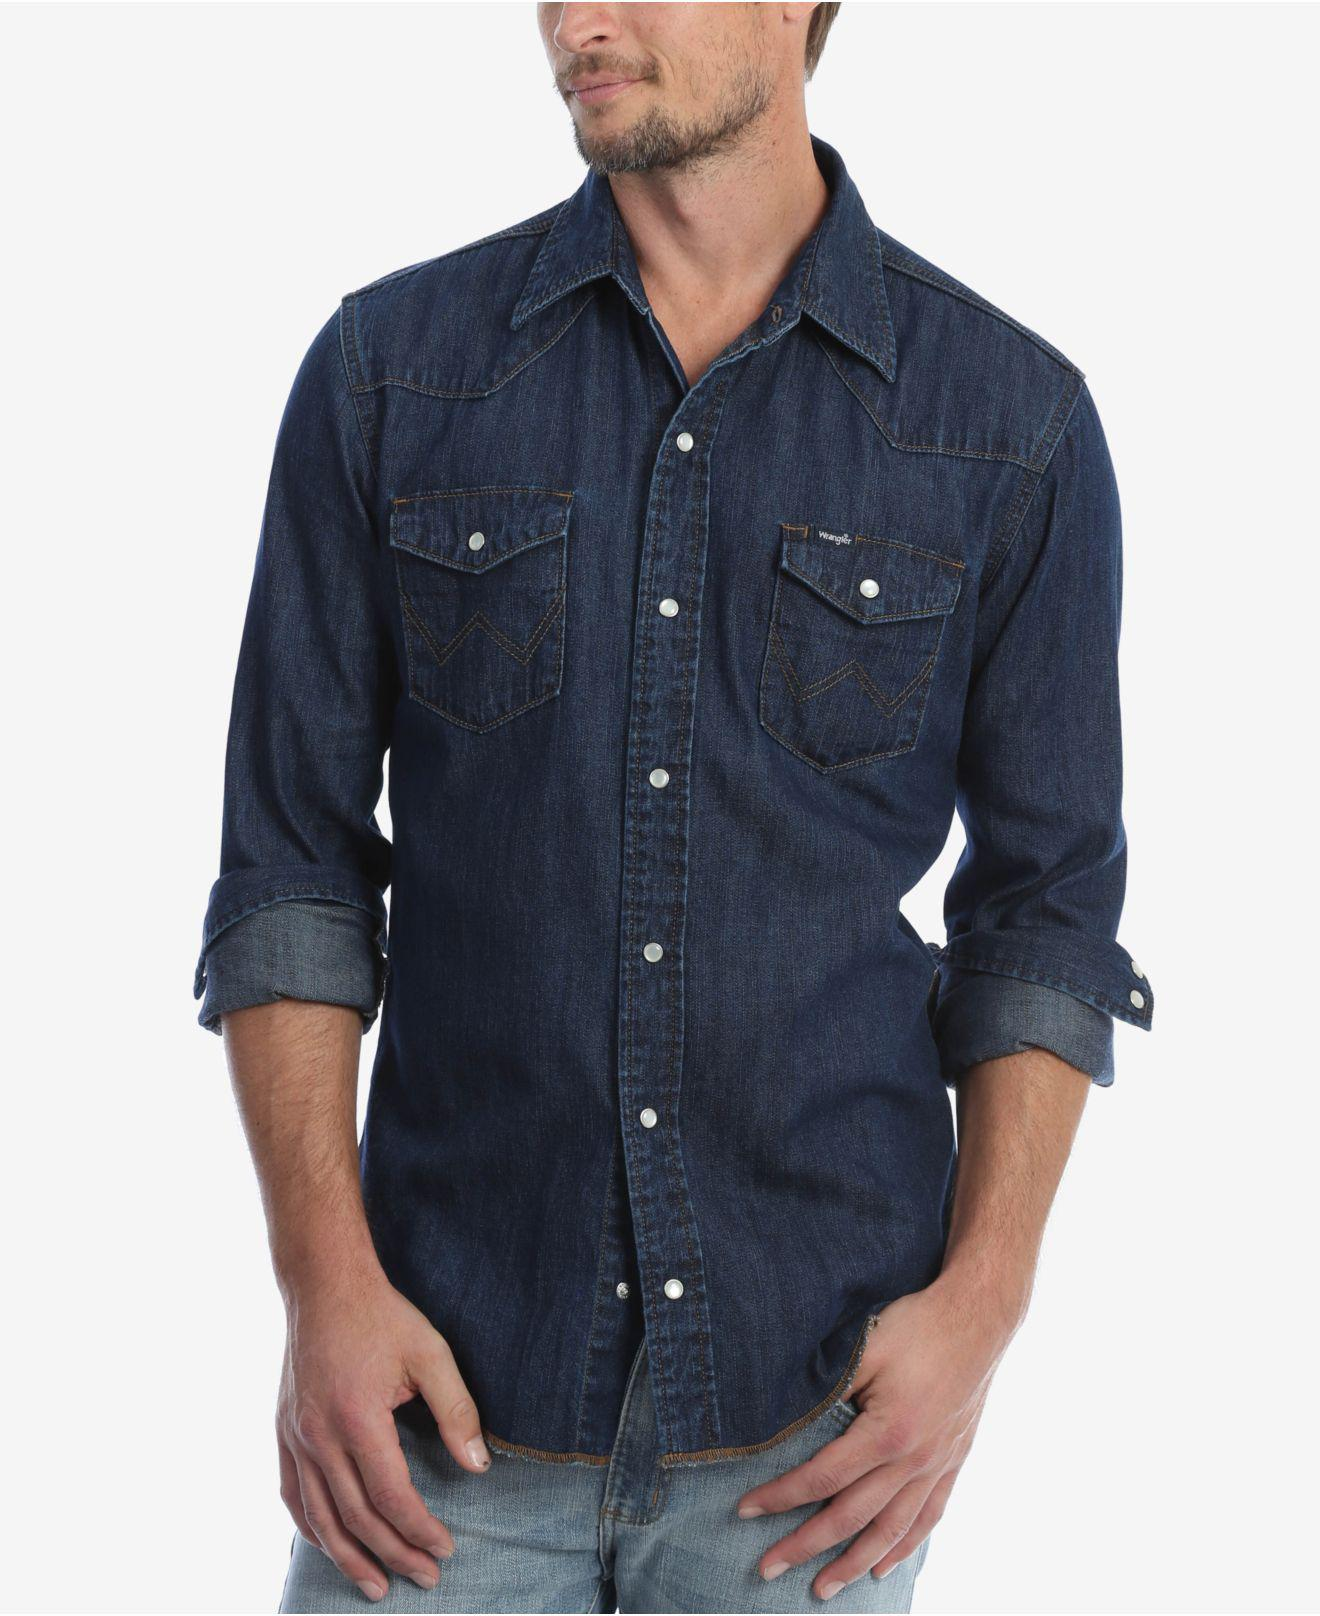 3e025658 Lyst - Wrangler Authentic Western Long Sleeve Shirt in Blue for Men